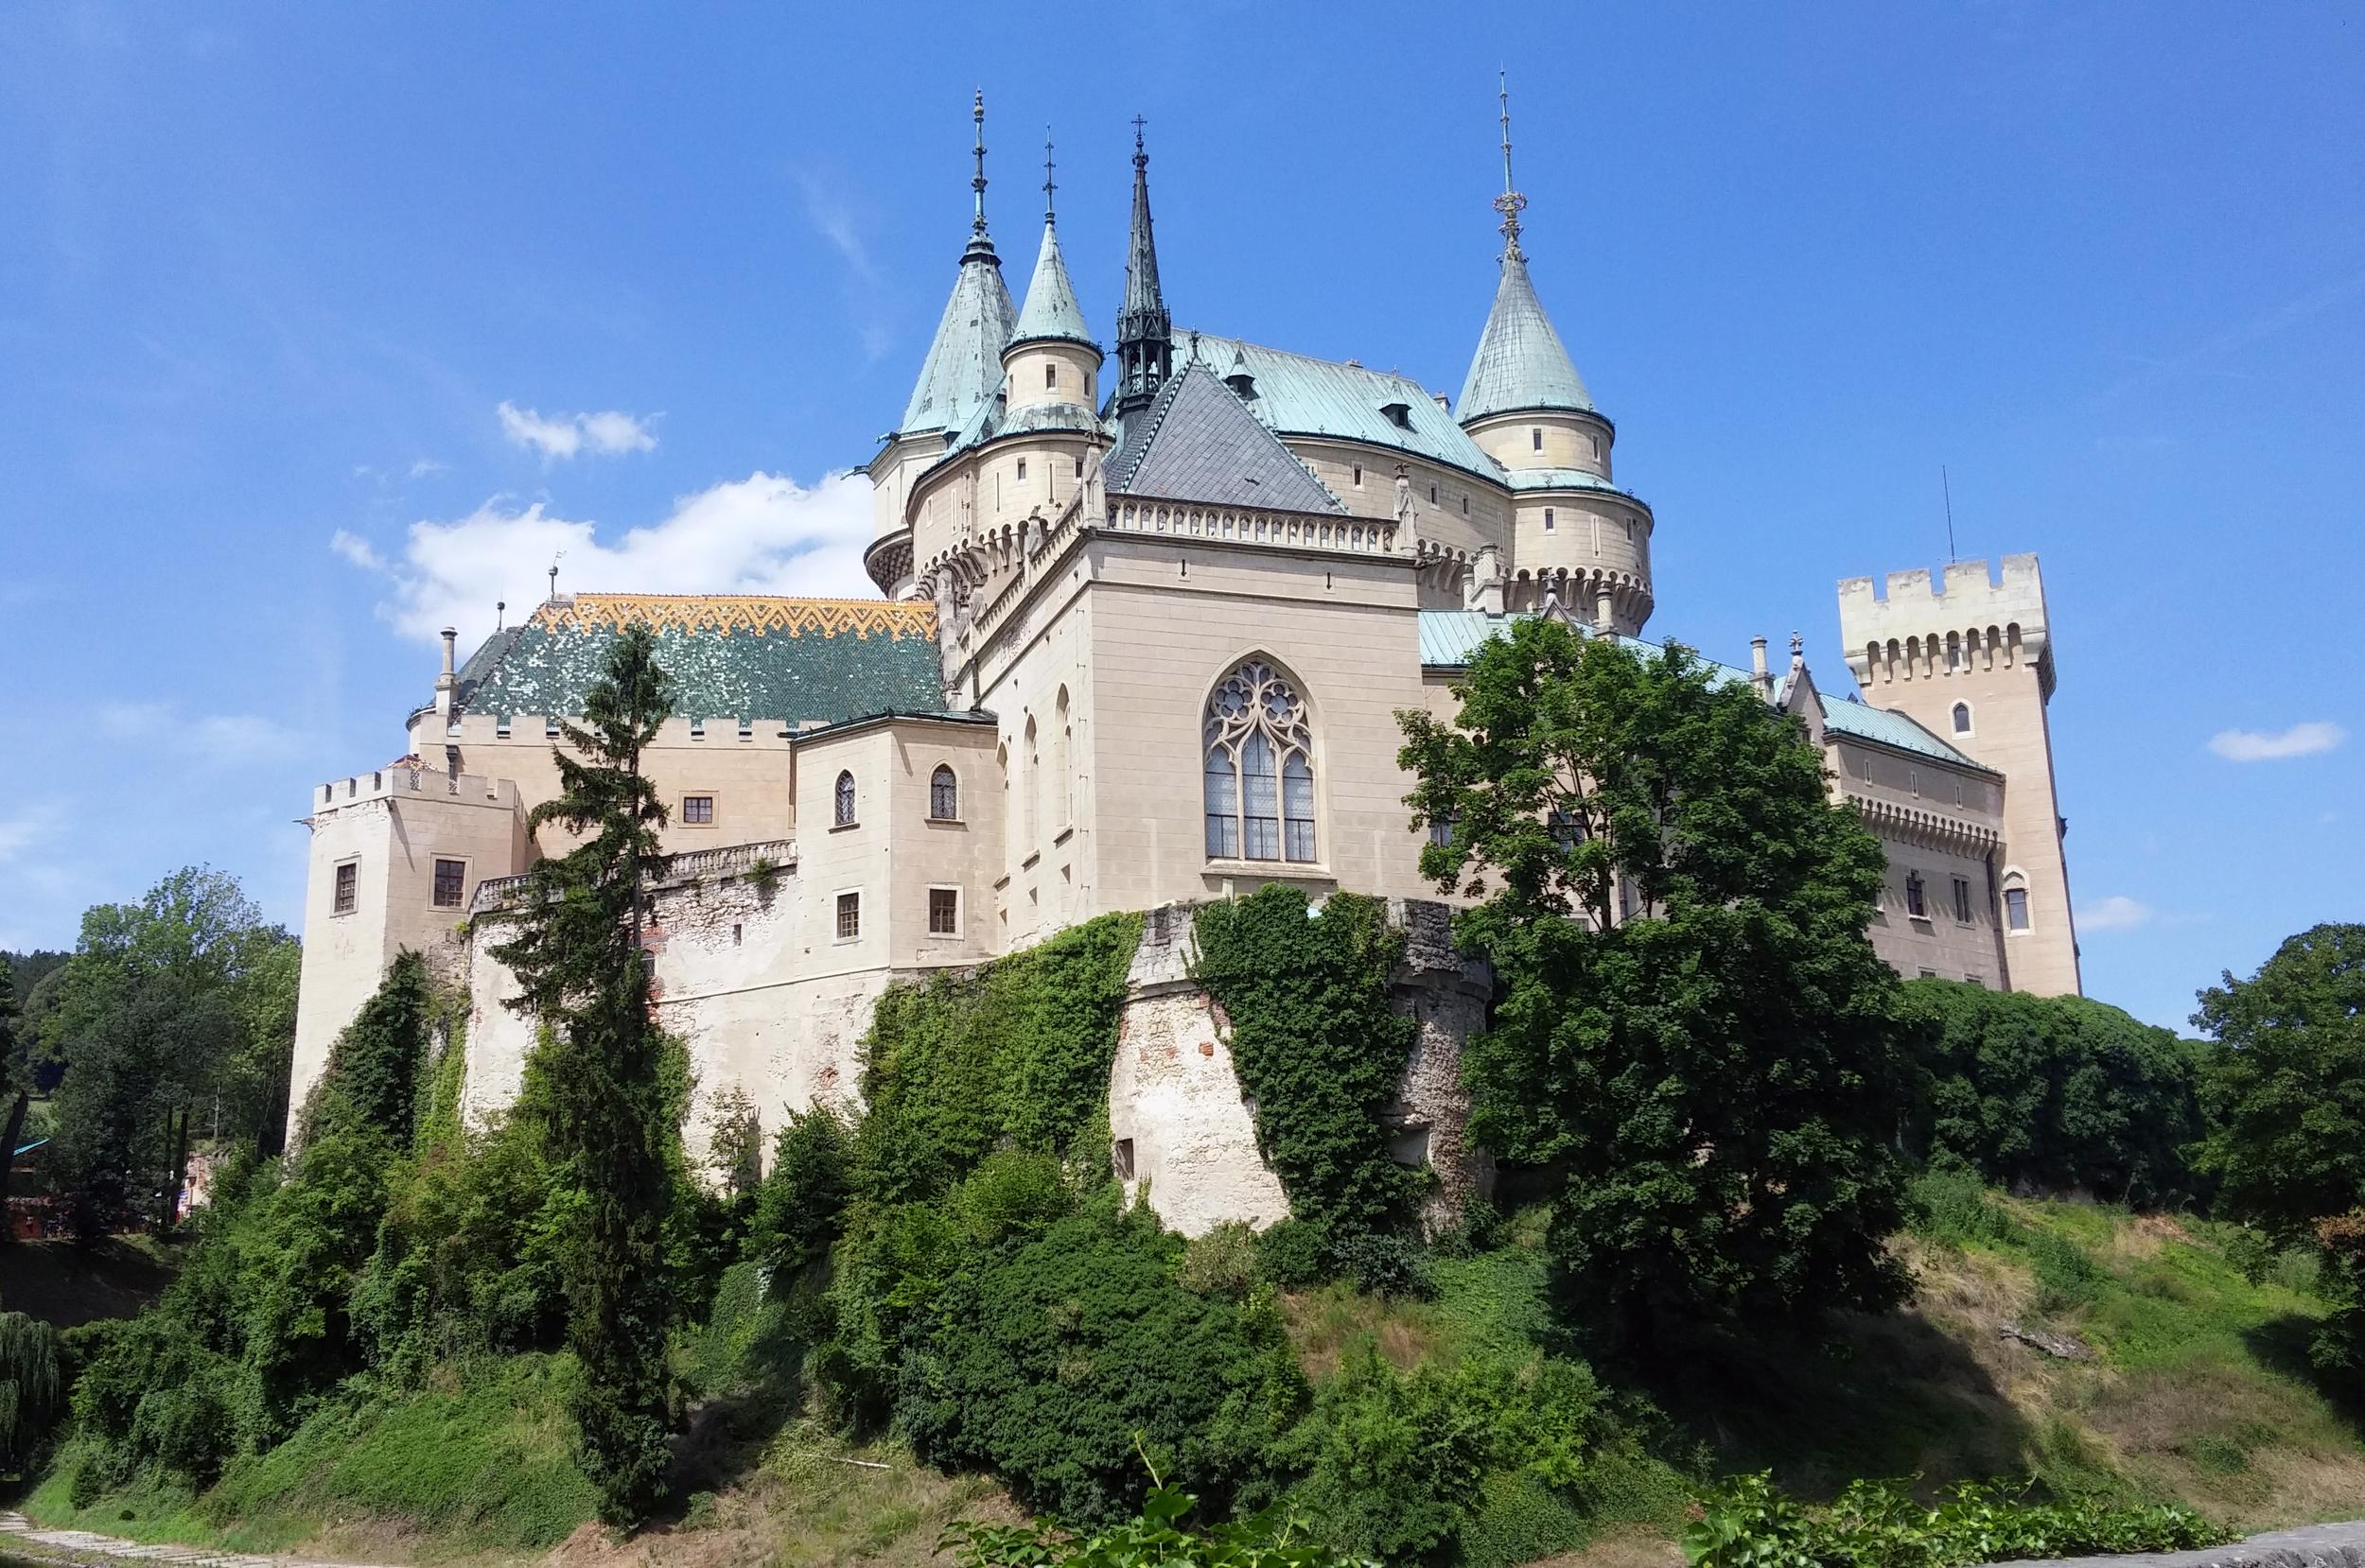 Not KIA but Bojnice Castle in Slovakia